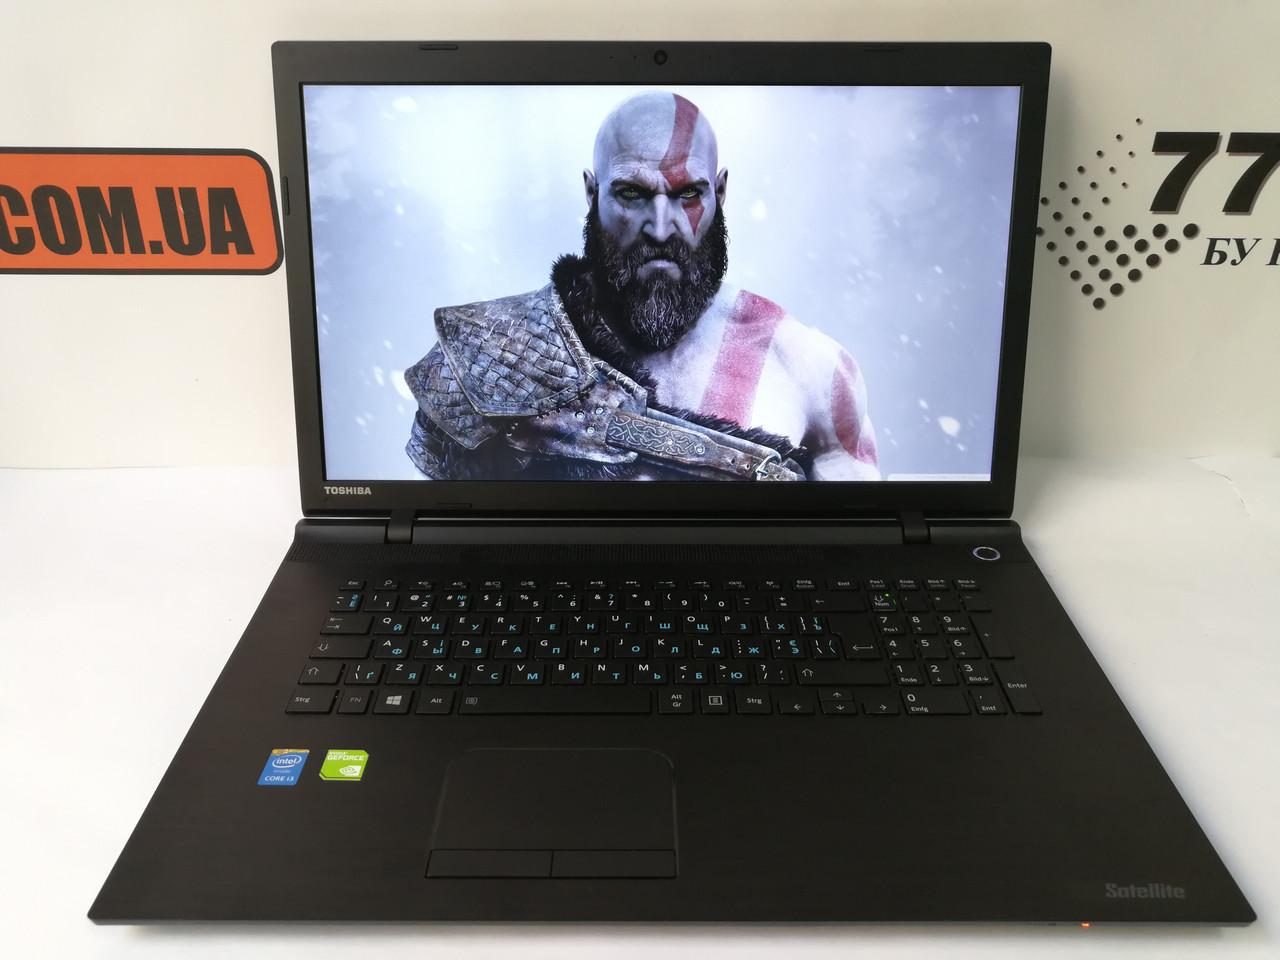 "Ноутбук Toshiba Satellite C70, 17.3"", Intel Core i3-5005U 2GHz, RAM 8ГБ, SSD 120ГБ, HDD 1ТБ, GeForce GT930M"